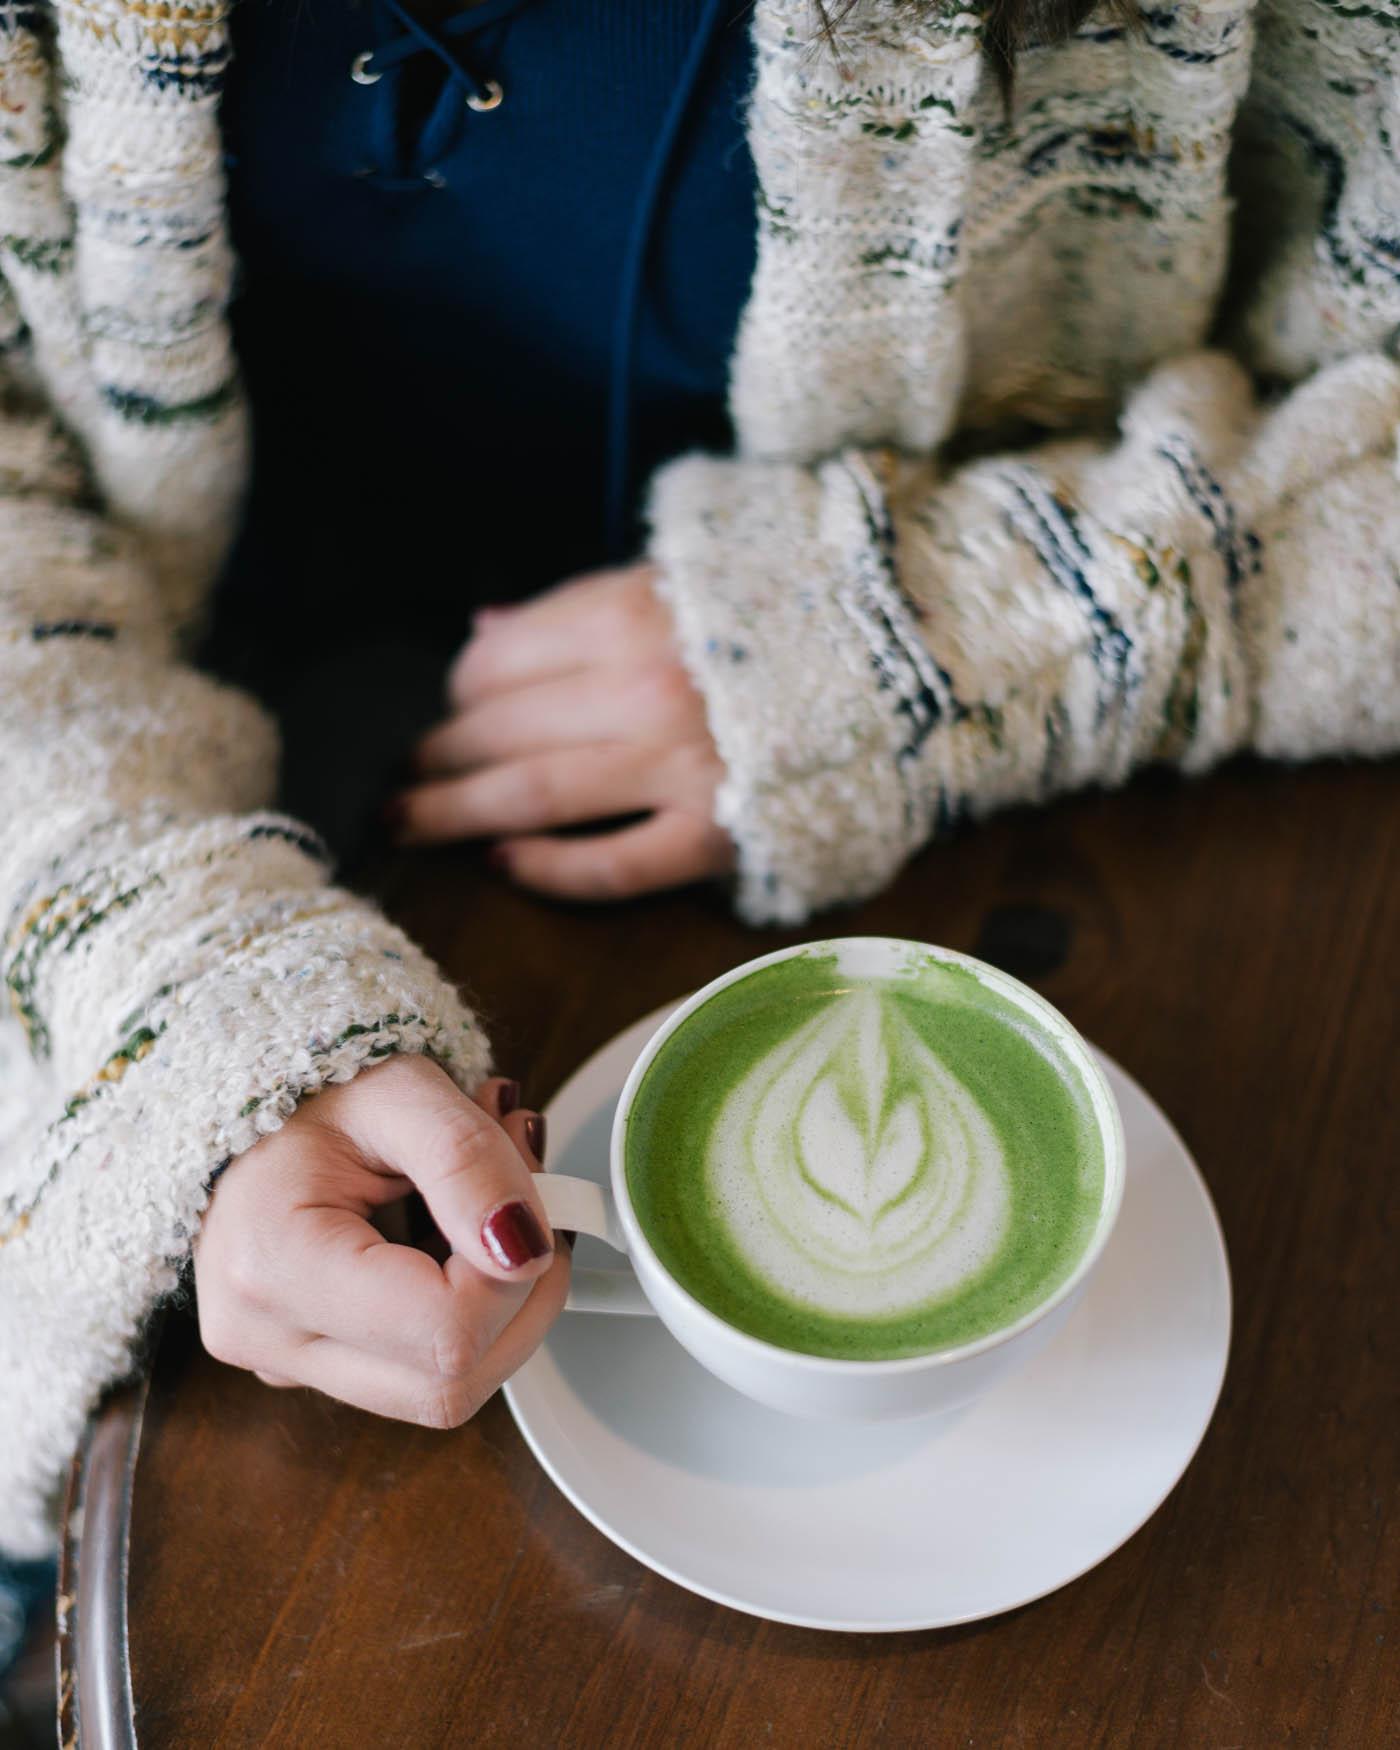 matcha latte, latte art, places to visit in Asheville, Asheville coffee shop - My Style Vita @mystylevita